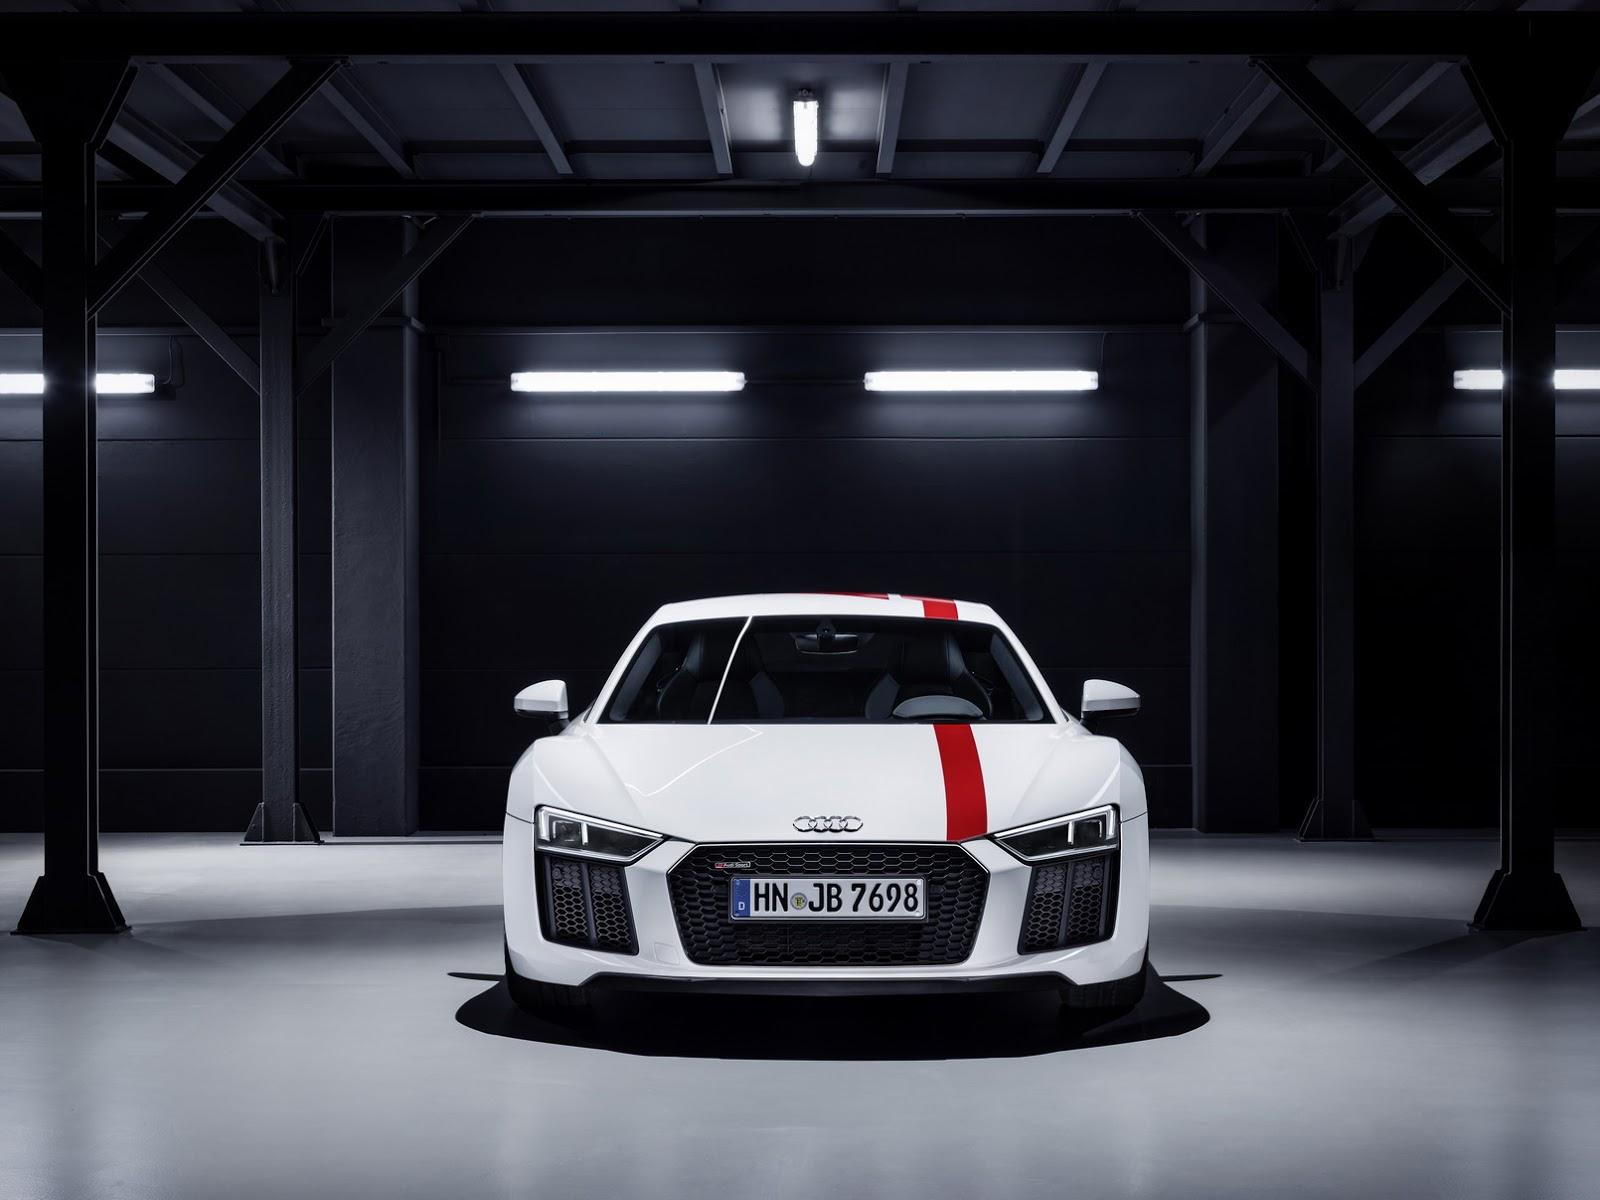 2018_Audi_R8_V10_RWS_44